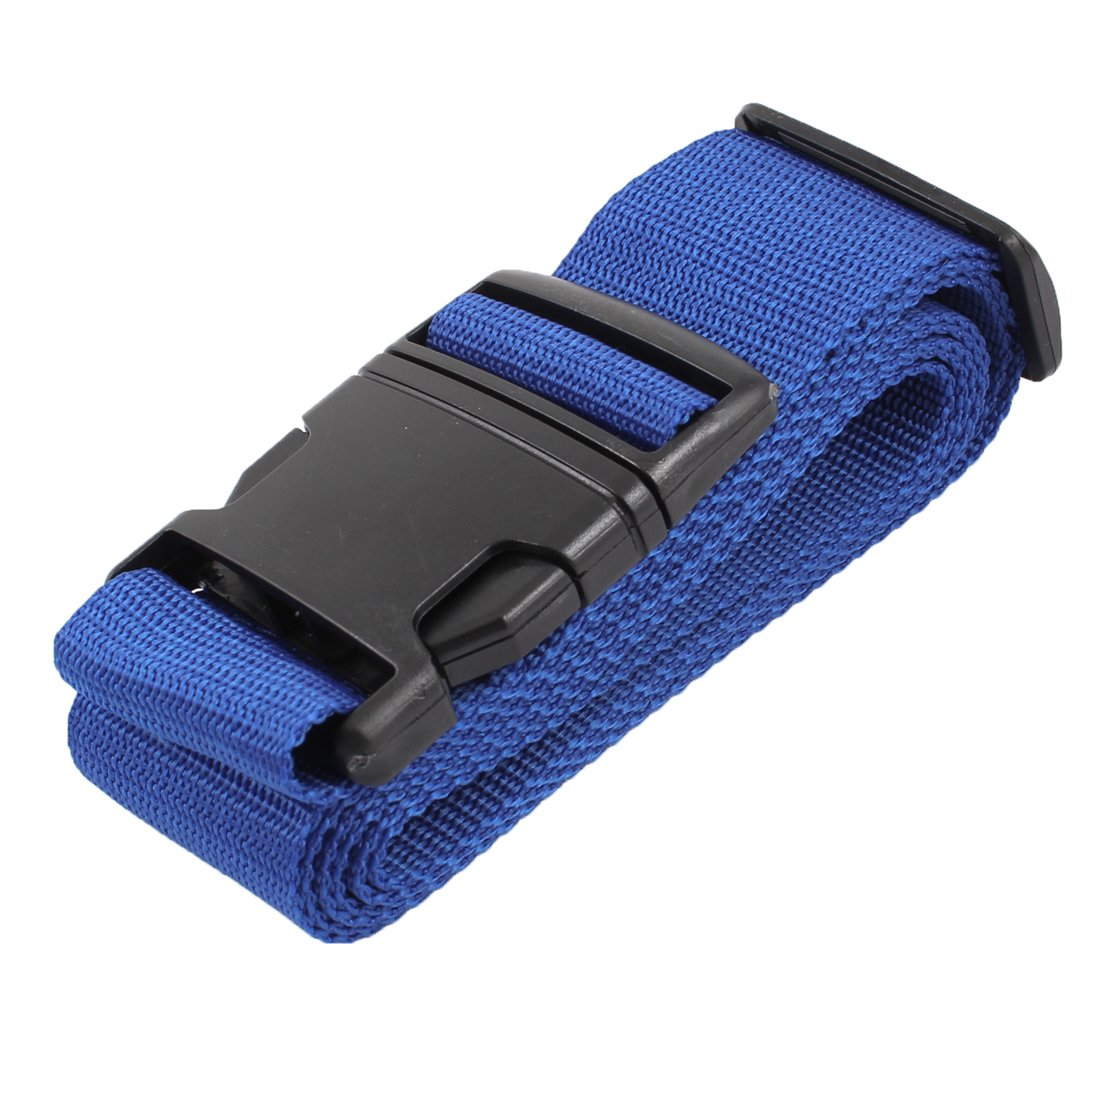 FGGS-Plastic Release Buckle Adjustable Luggage Strap Belt Black Blue luggage belt strap w quick release buckle id tag blue grey black 2m